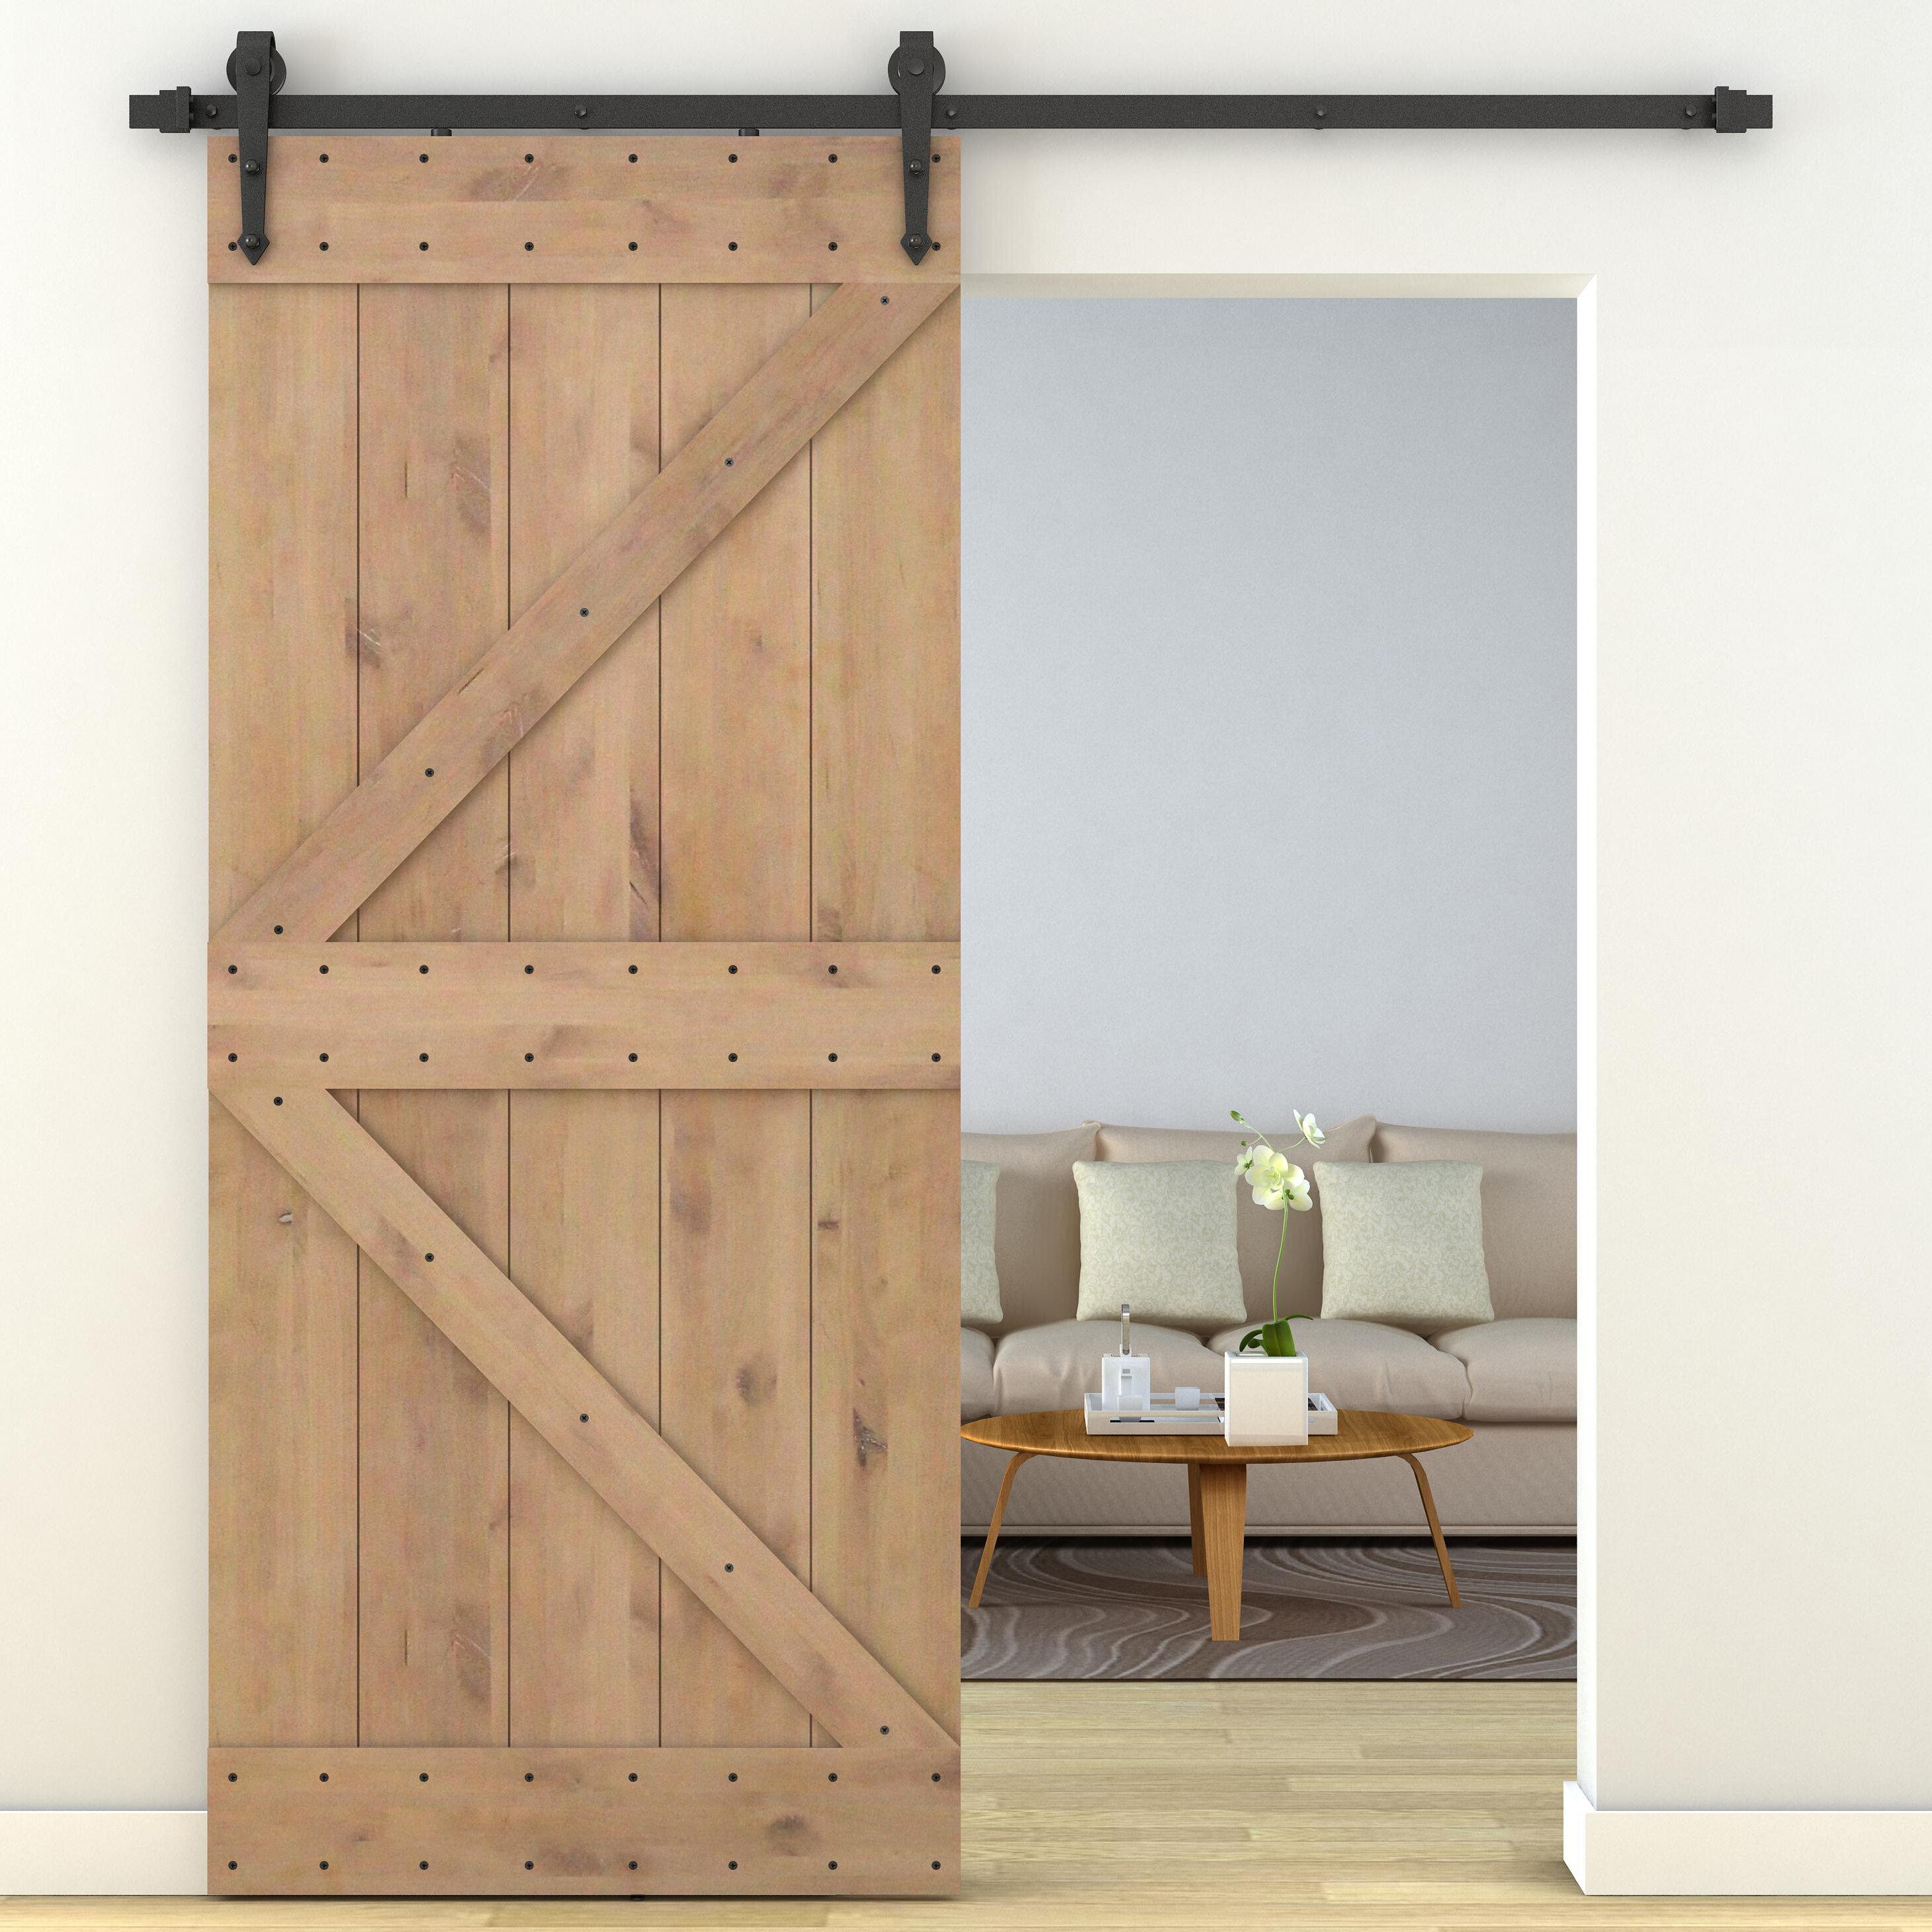 Calhome Primed Sliding Knotty Solid Wood Panelled Alder Interior Barn Door | Wayfair & Calhome Primed Sliding Knotty Solid Wood Panelled Alder Interior ...